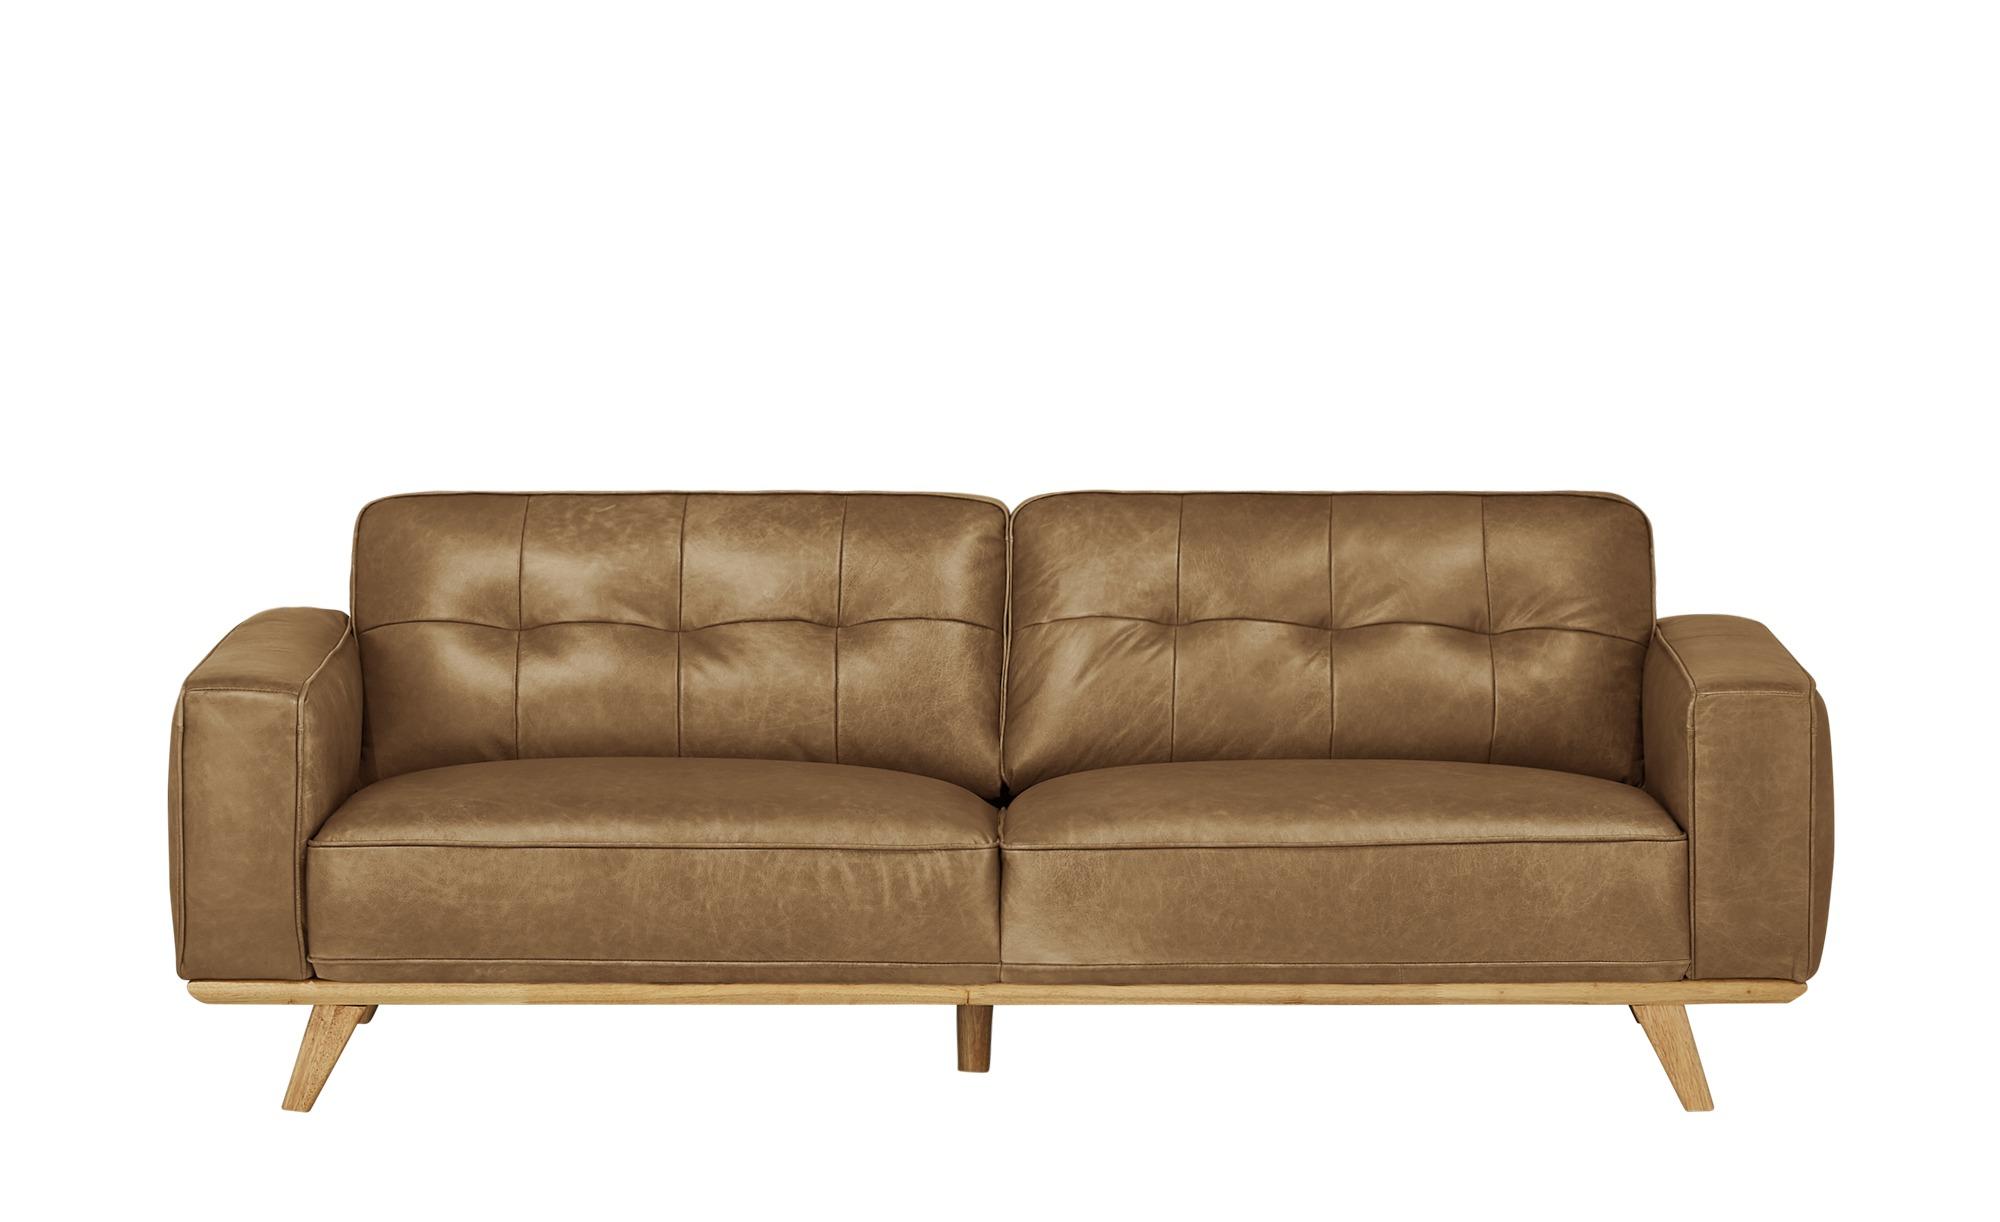 uno Ledersofa  Caralina ¦ braun ¦ Maße (cm): B: 227 H: 78 T: 95 Polstermöbel > Sofas > 3-Sitzer - Höffner